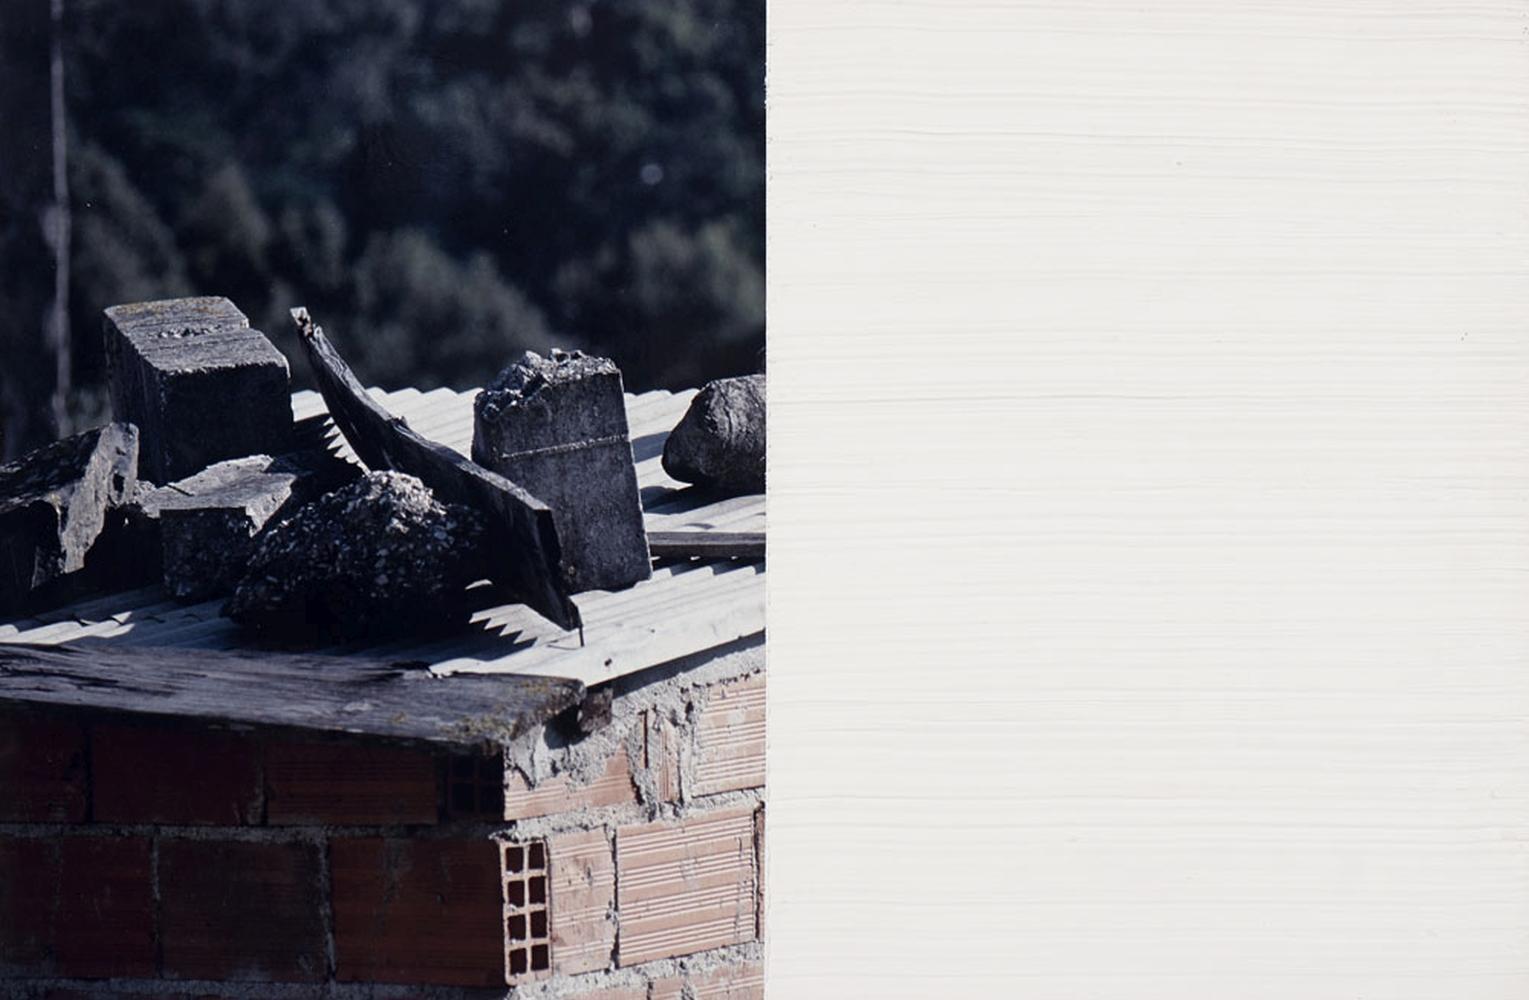 CABRITA REIS,mista s/fotografia, 50 x 75 cm.